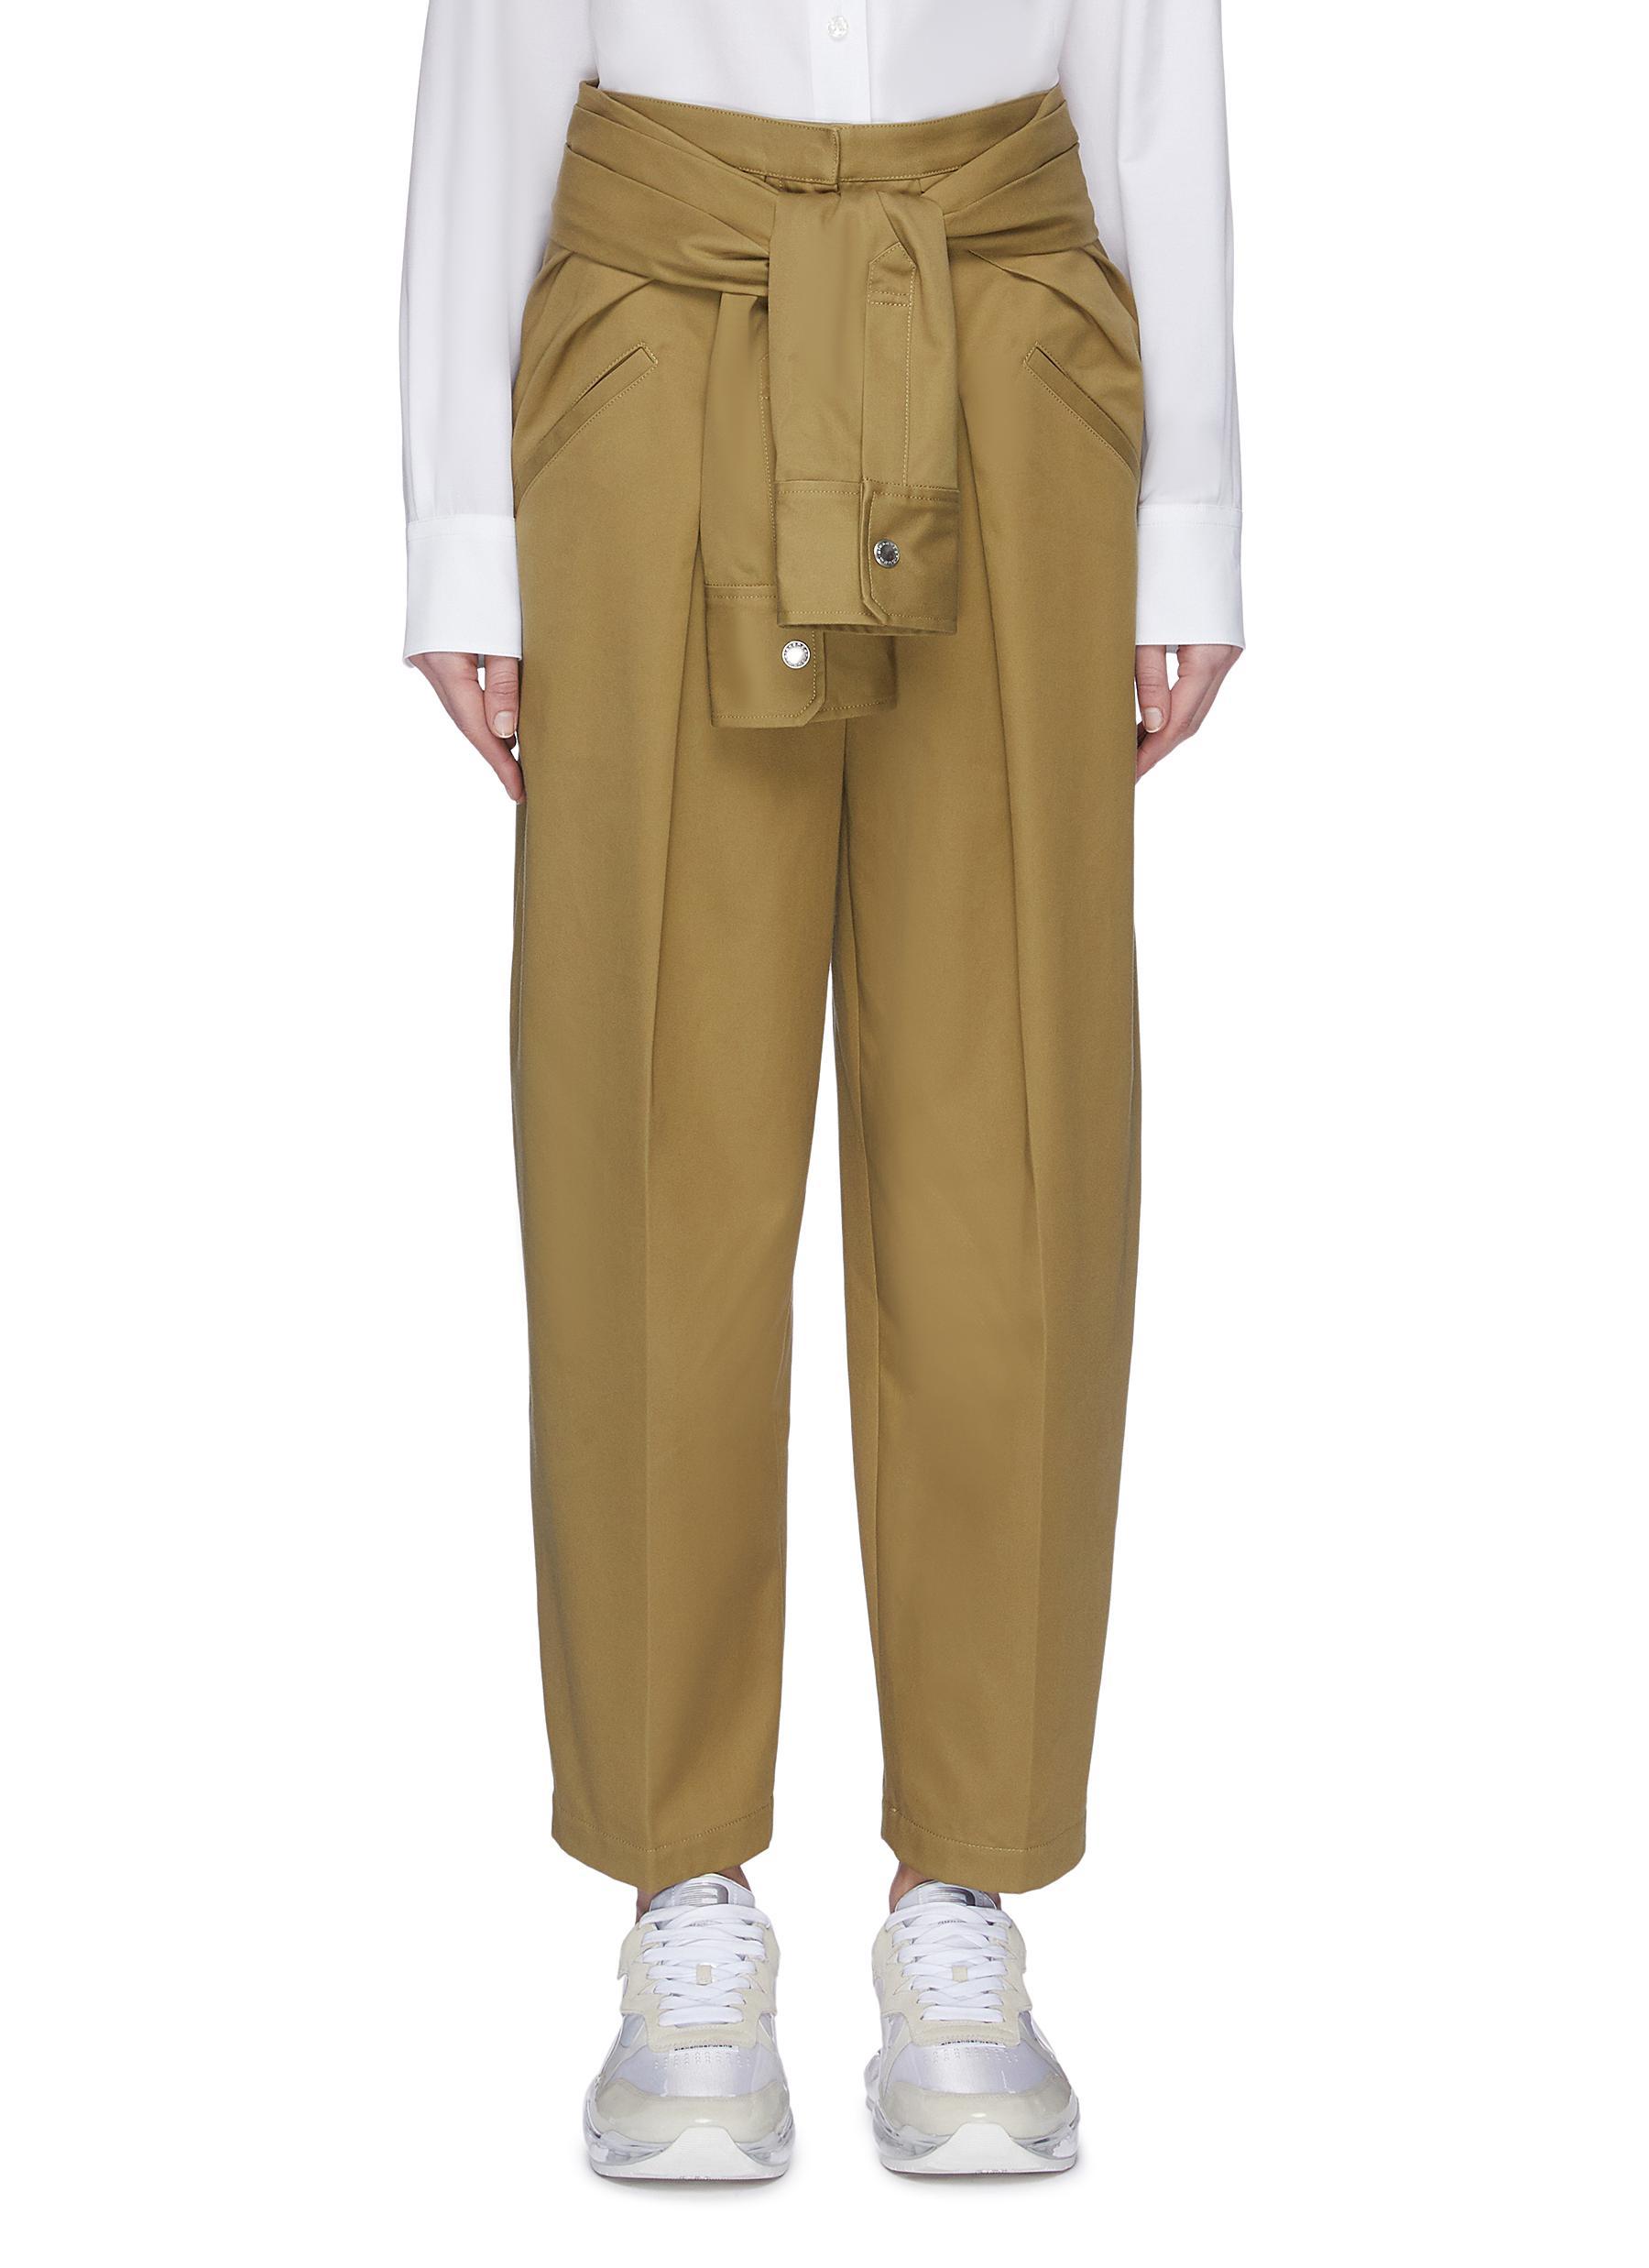 Buy Alexander Wang Pants & Shorts Tie front waist pants